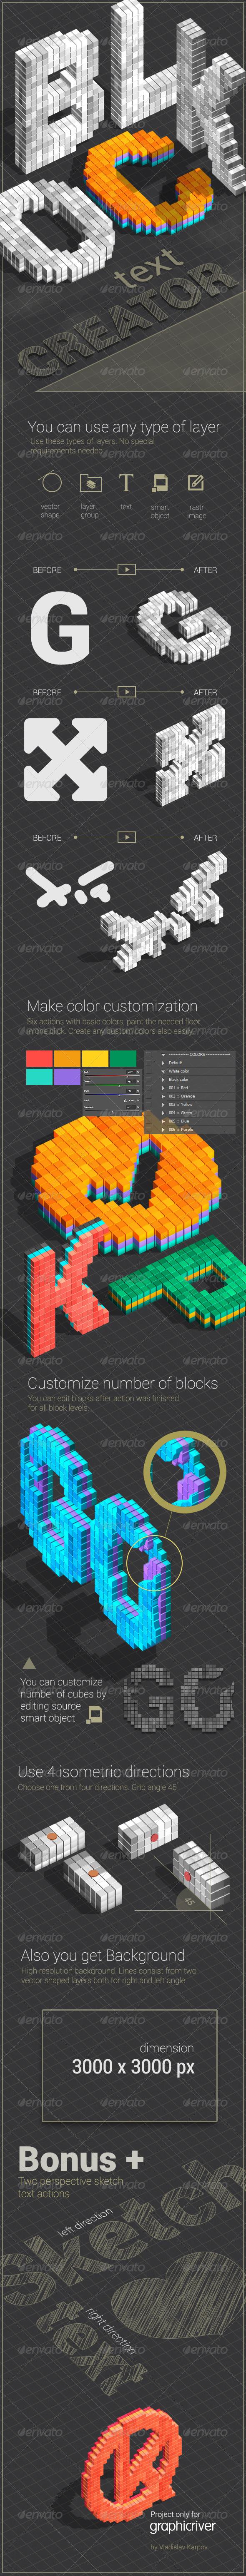 GraphicRiver Blocks Text Creator 4858368